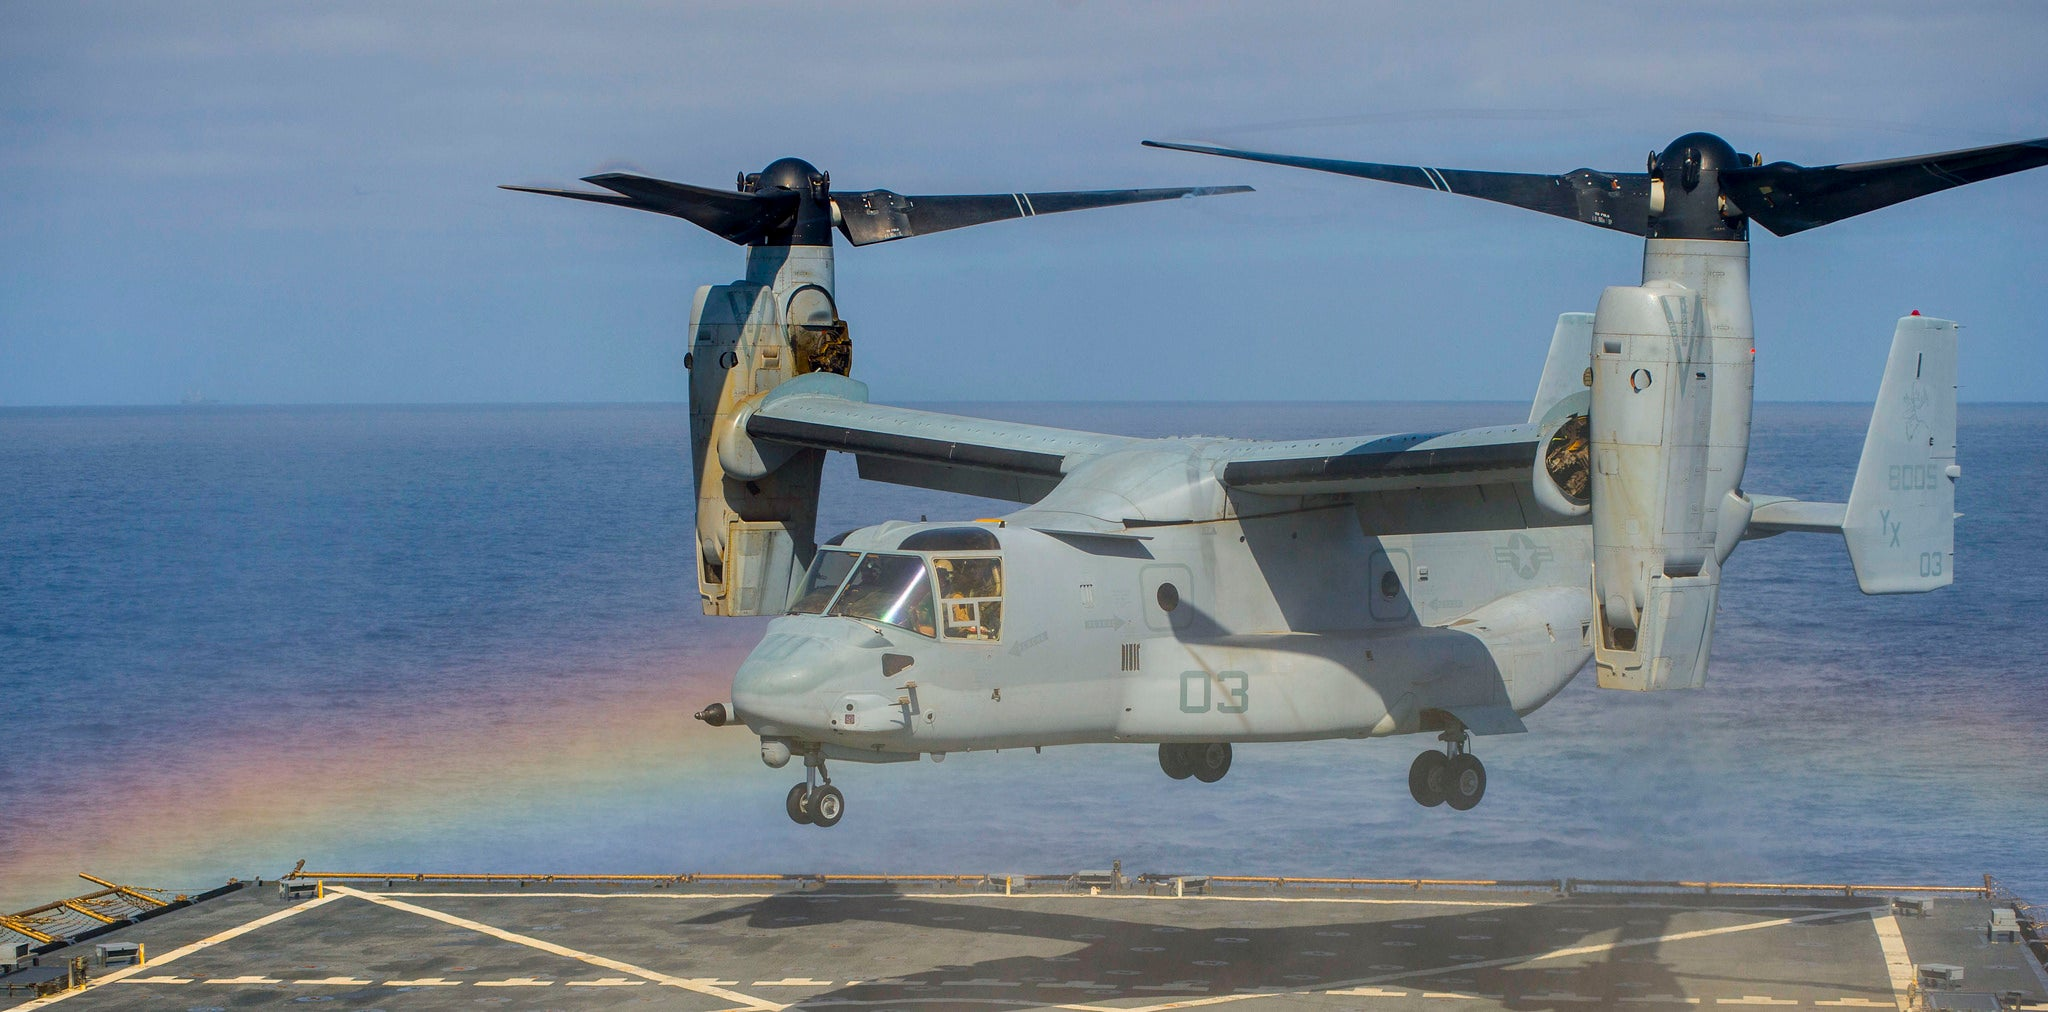 Awesome photo of a V-22 Osprey inside a rainbow